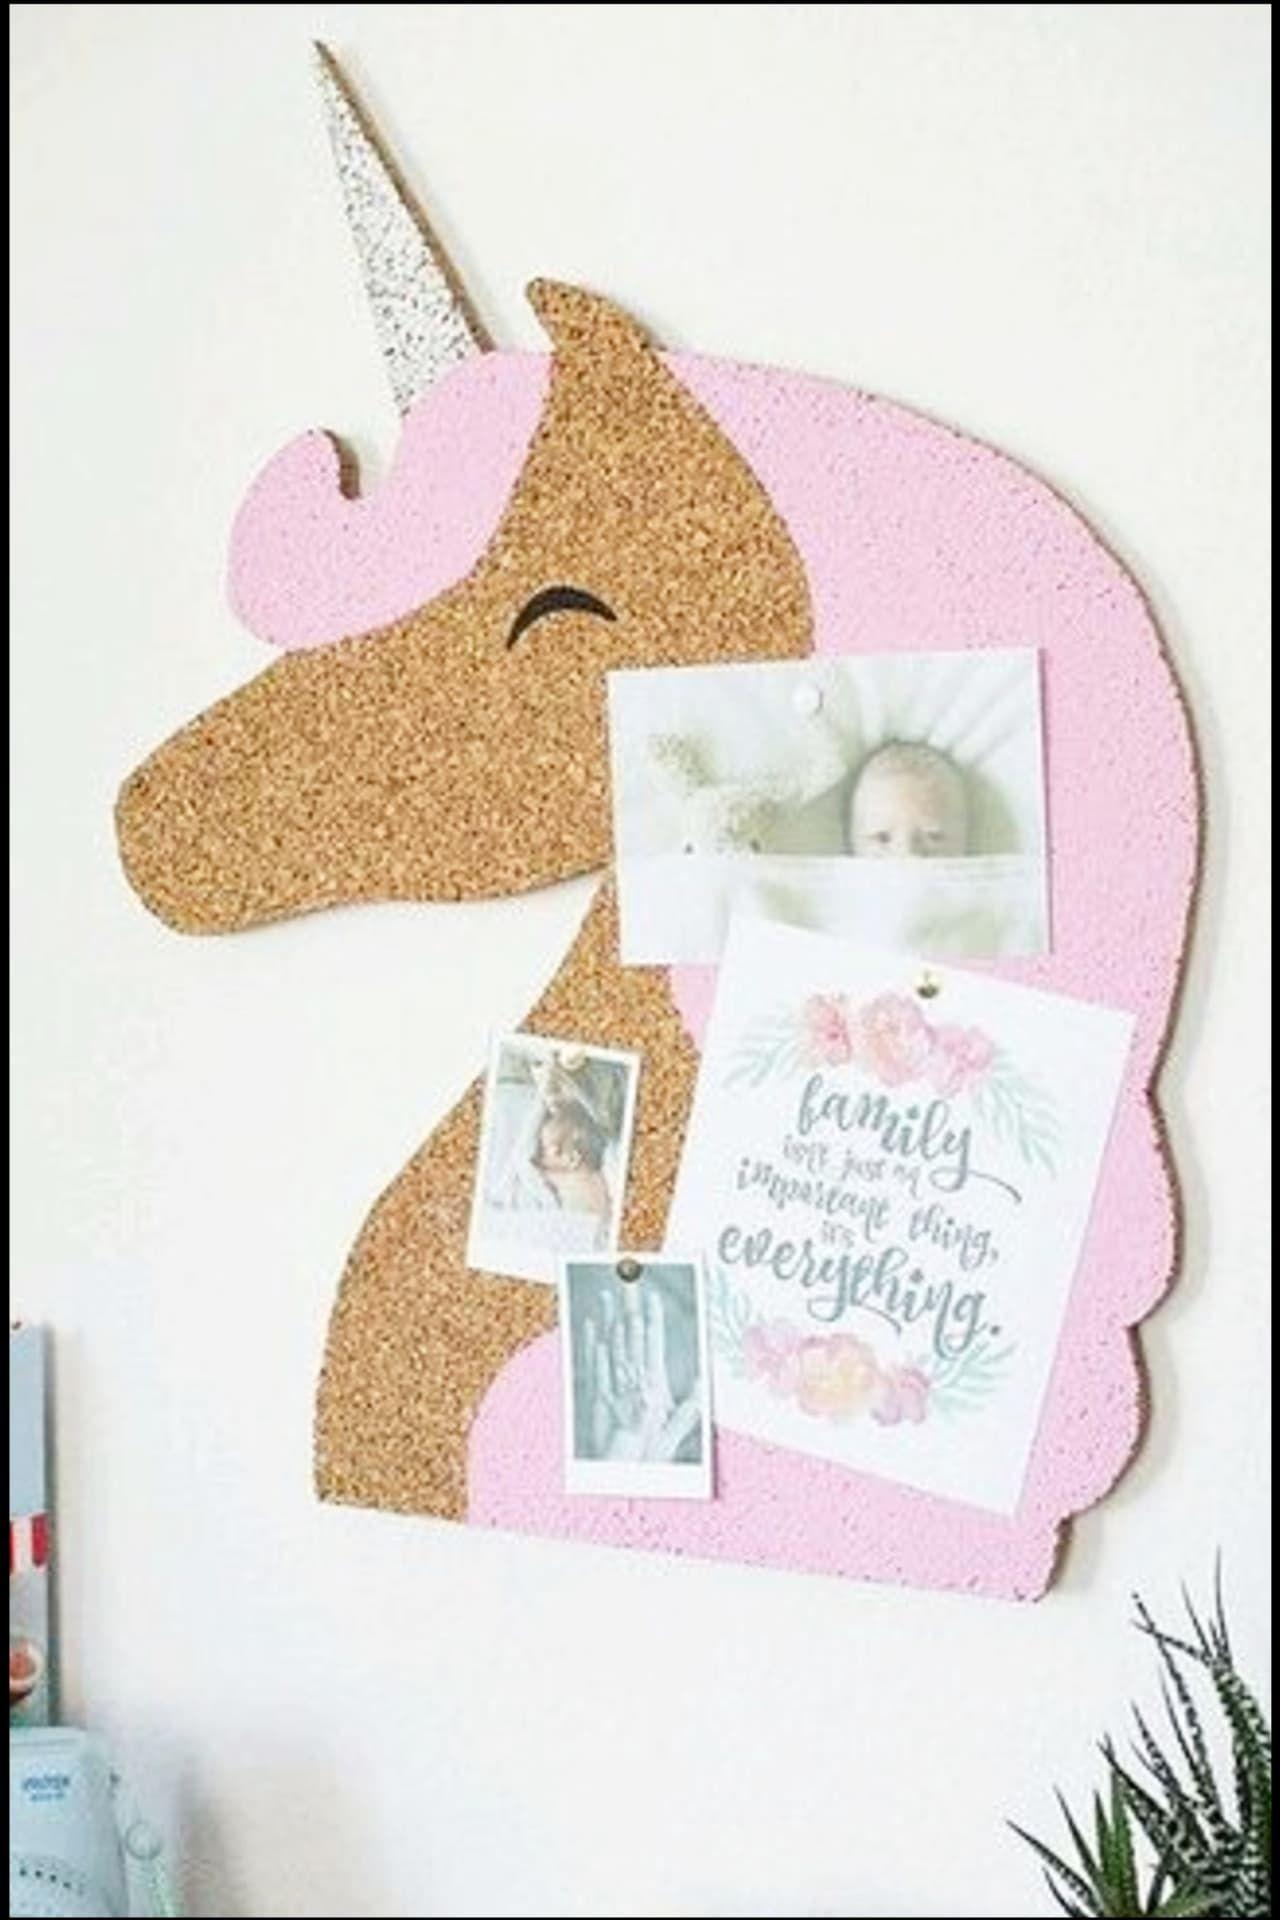 Unicorn Crafts for Kids - Cute & Easy DIY Unicorn Craft Ideas - Involvery #unicorncrafts